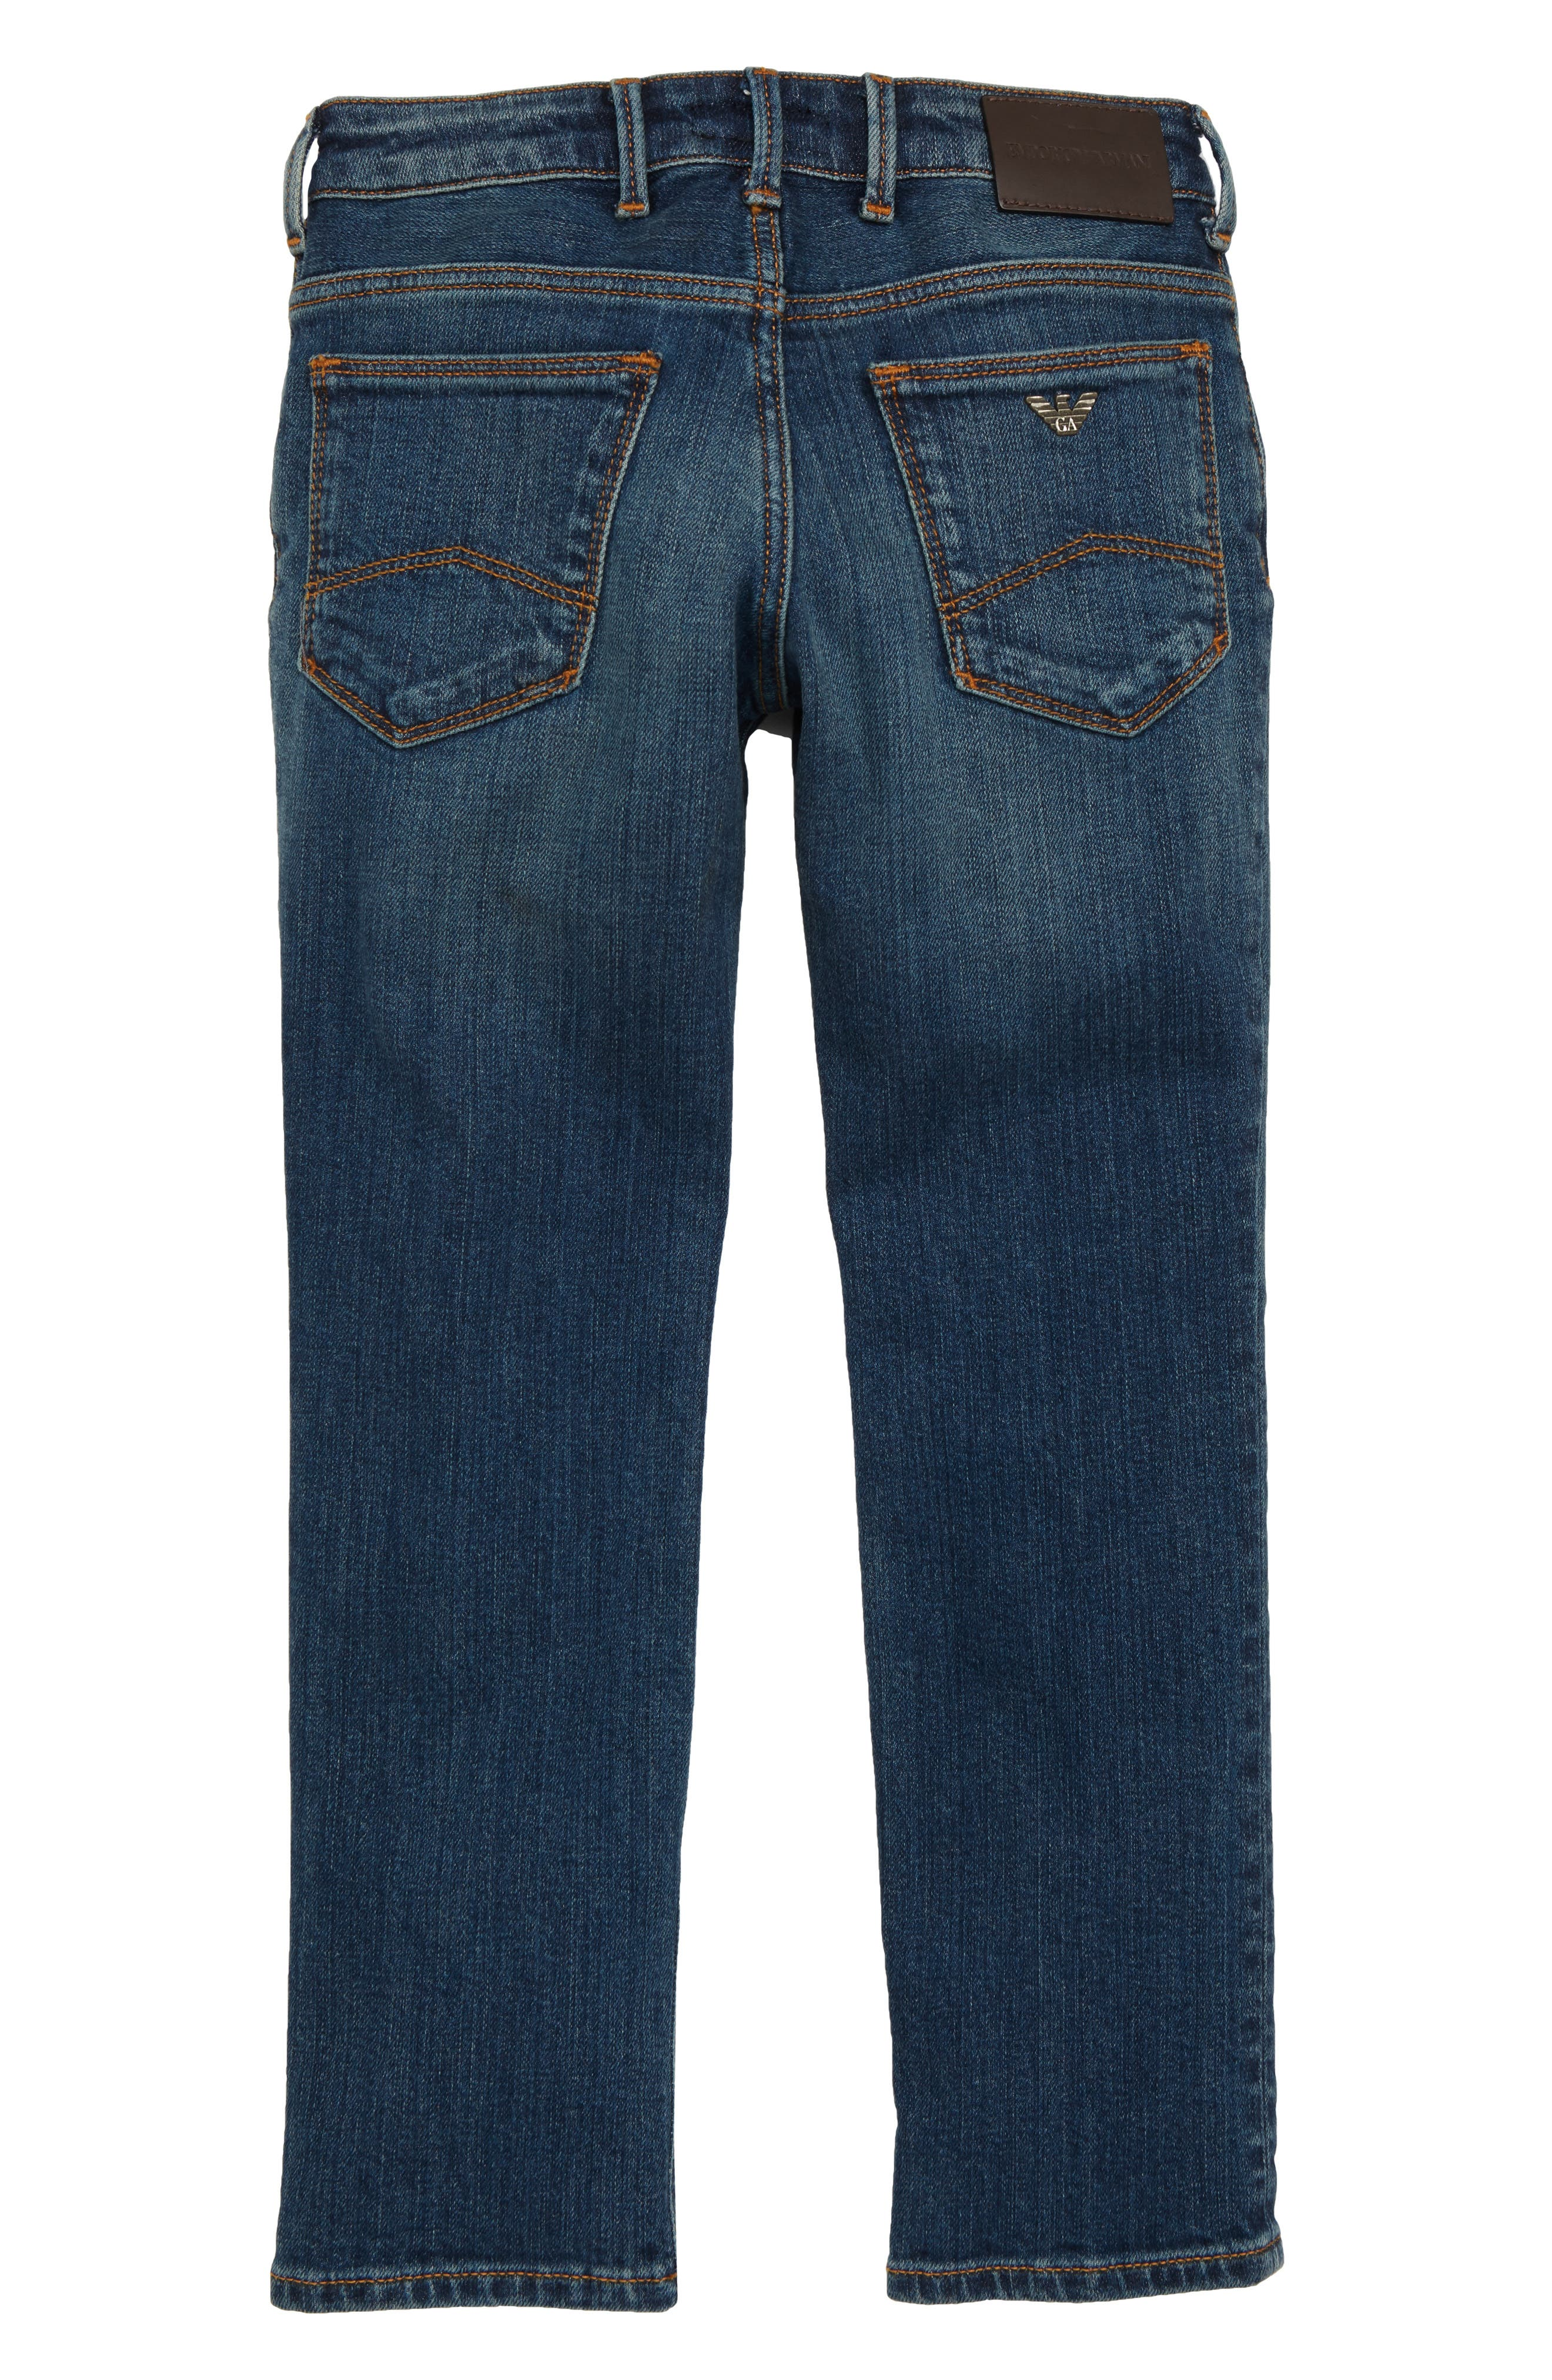 ARMANI JUNIOR,                             Denim Jeans,                             Alternate thumbnail 2, color,                             SOLID DARK BLUE